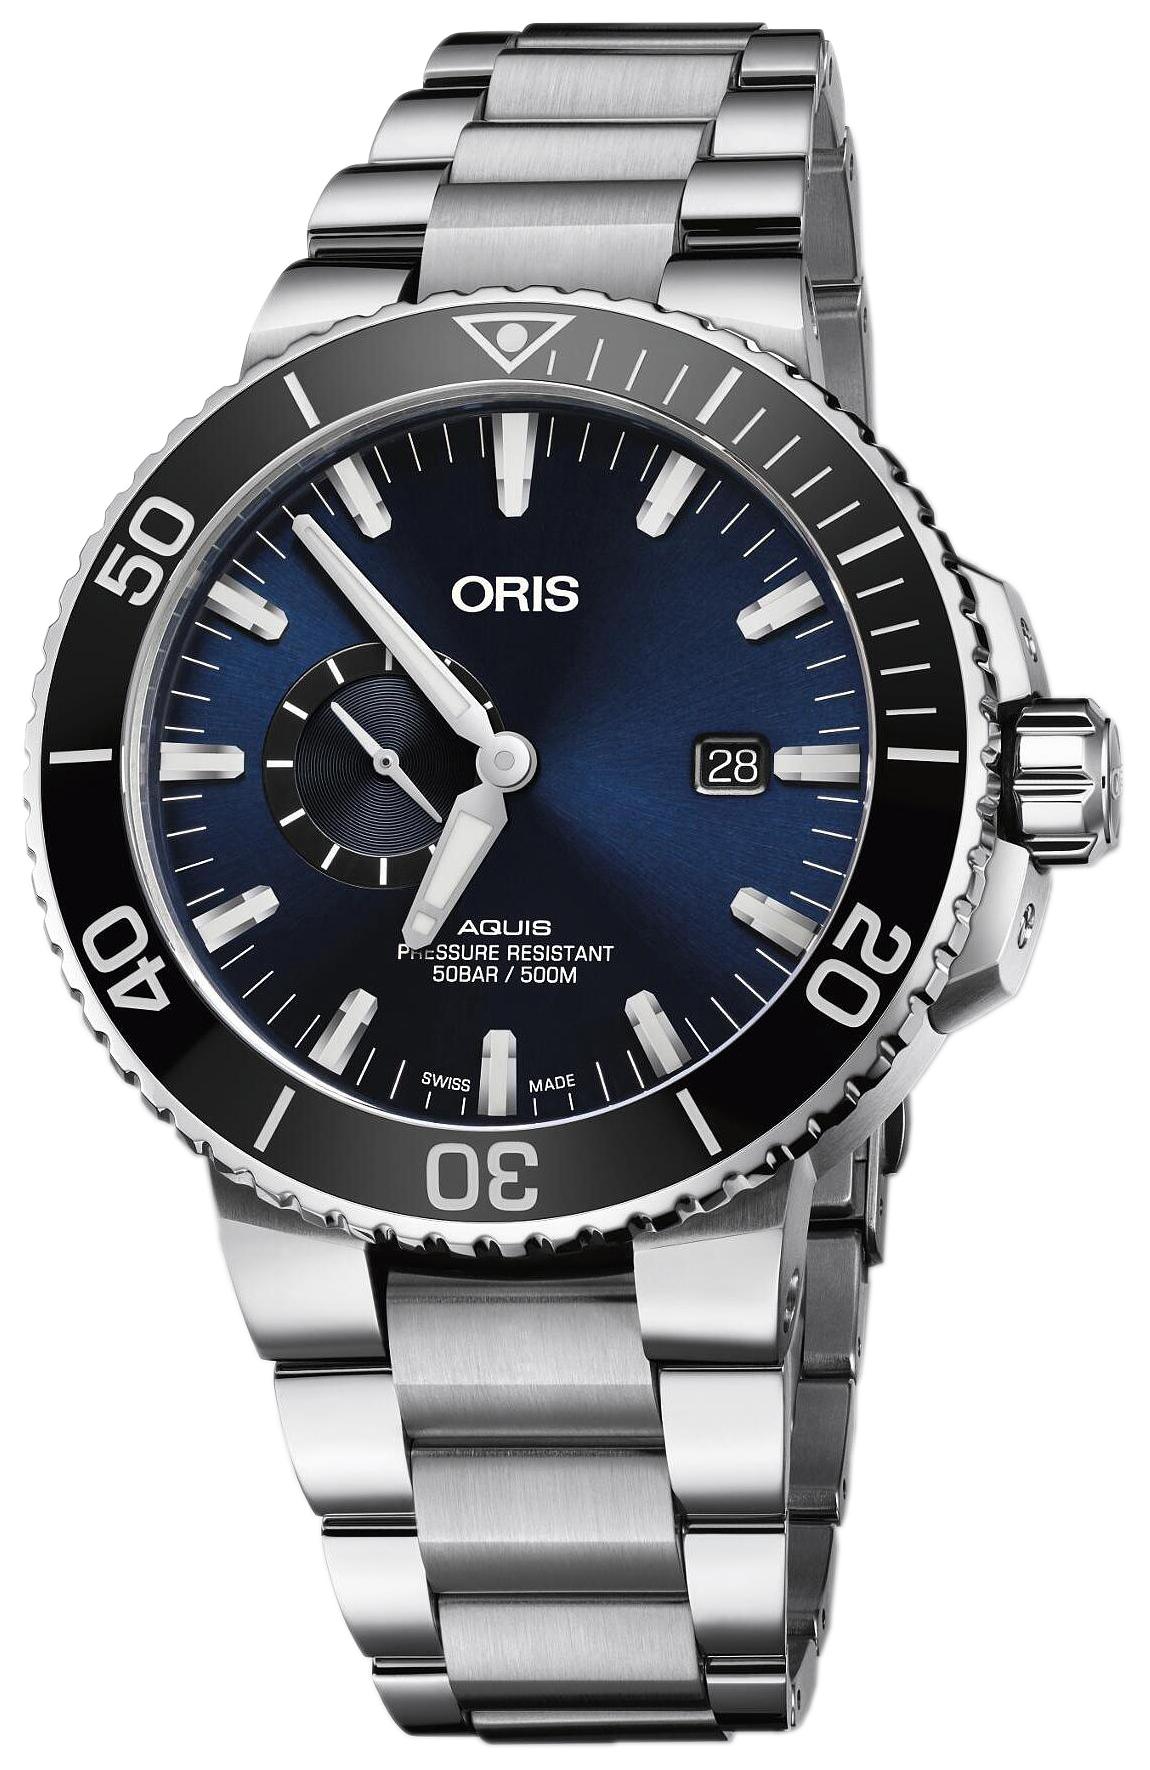 Oris Diving Herreklokke 01 743 7733 4135-07 8 24 05PEB Blå/Stål - Oris